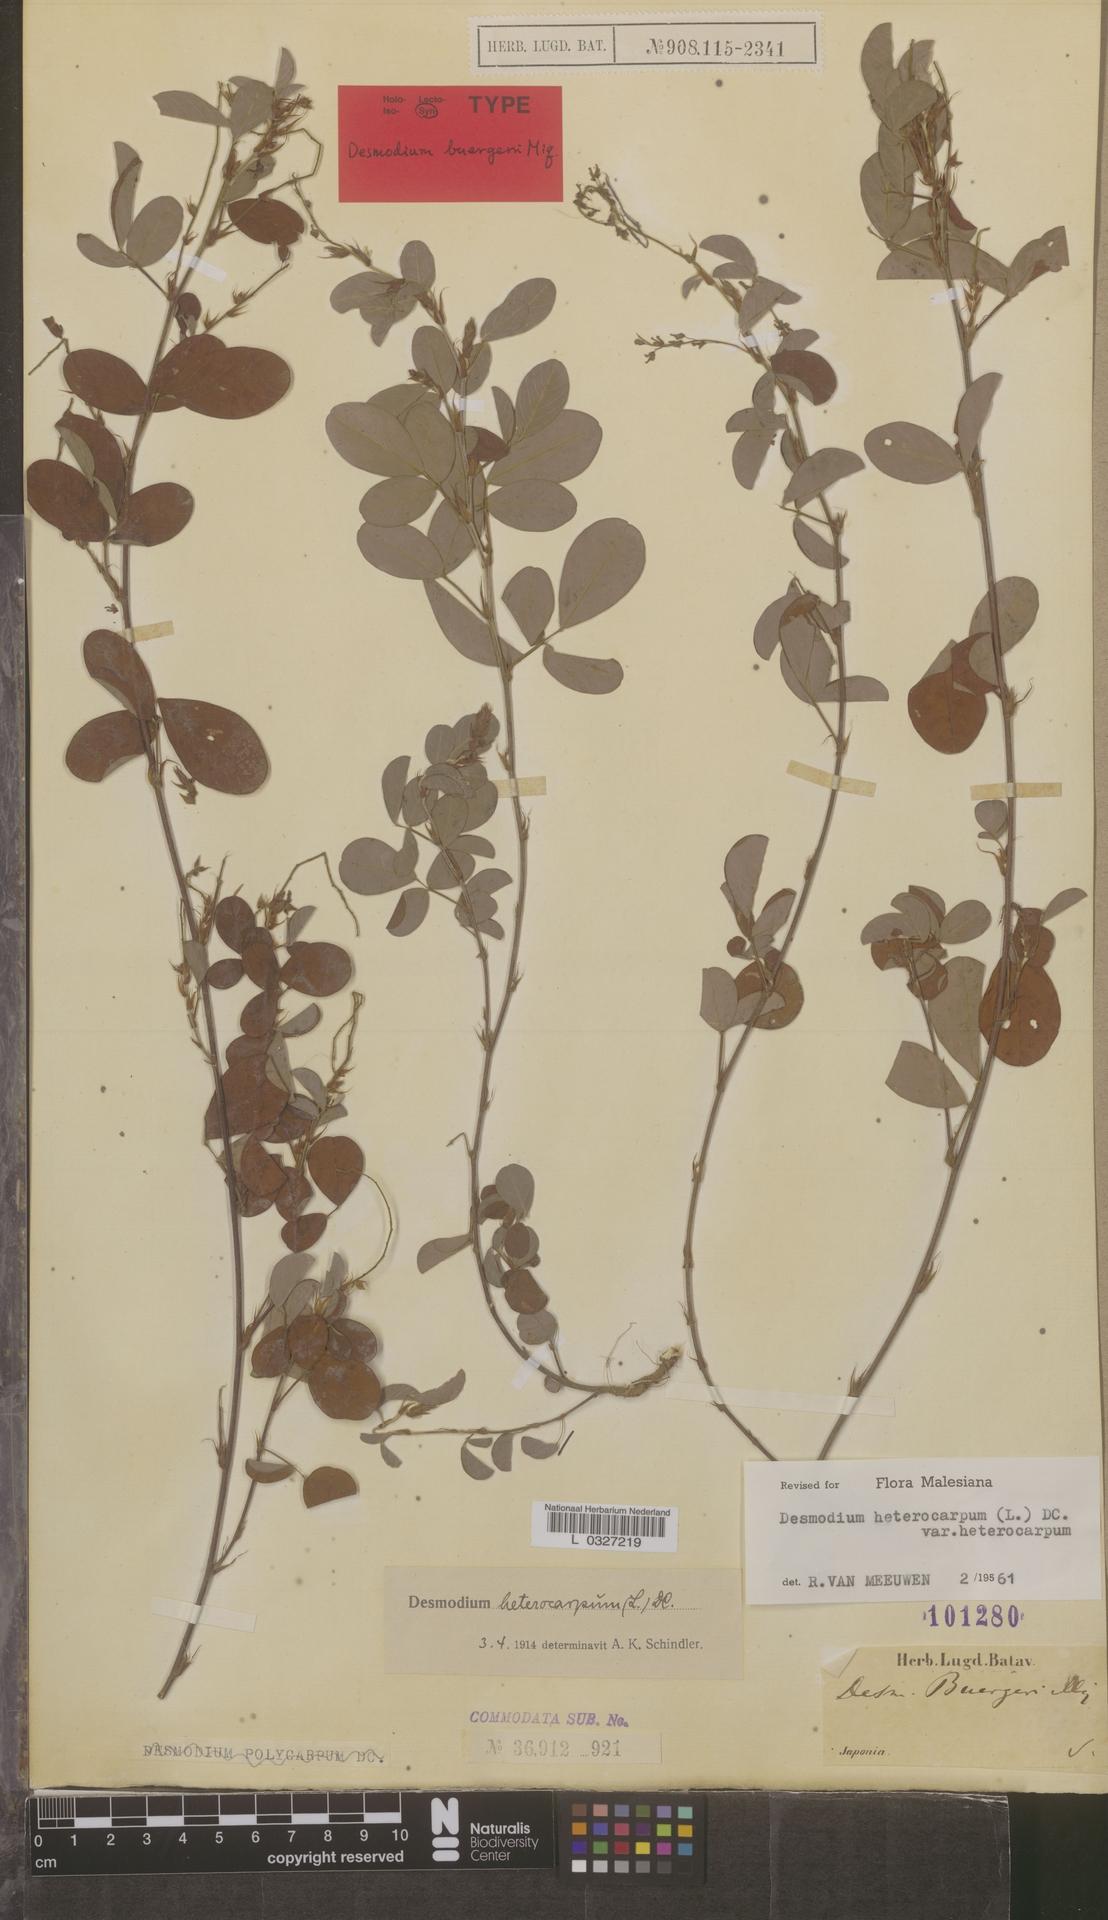 L  0327219 | Desmodium heterocarpon subsp. heterocarpon